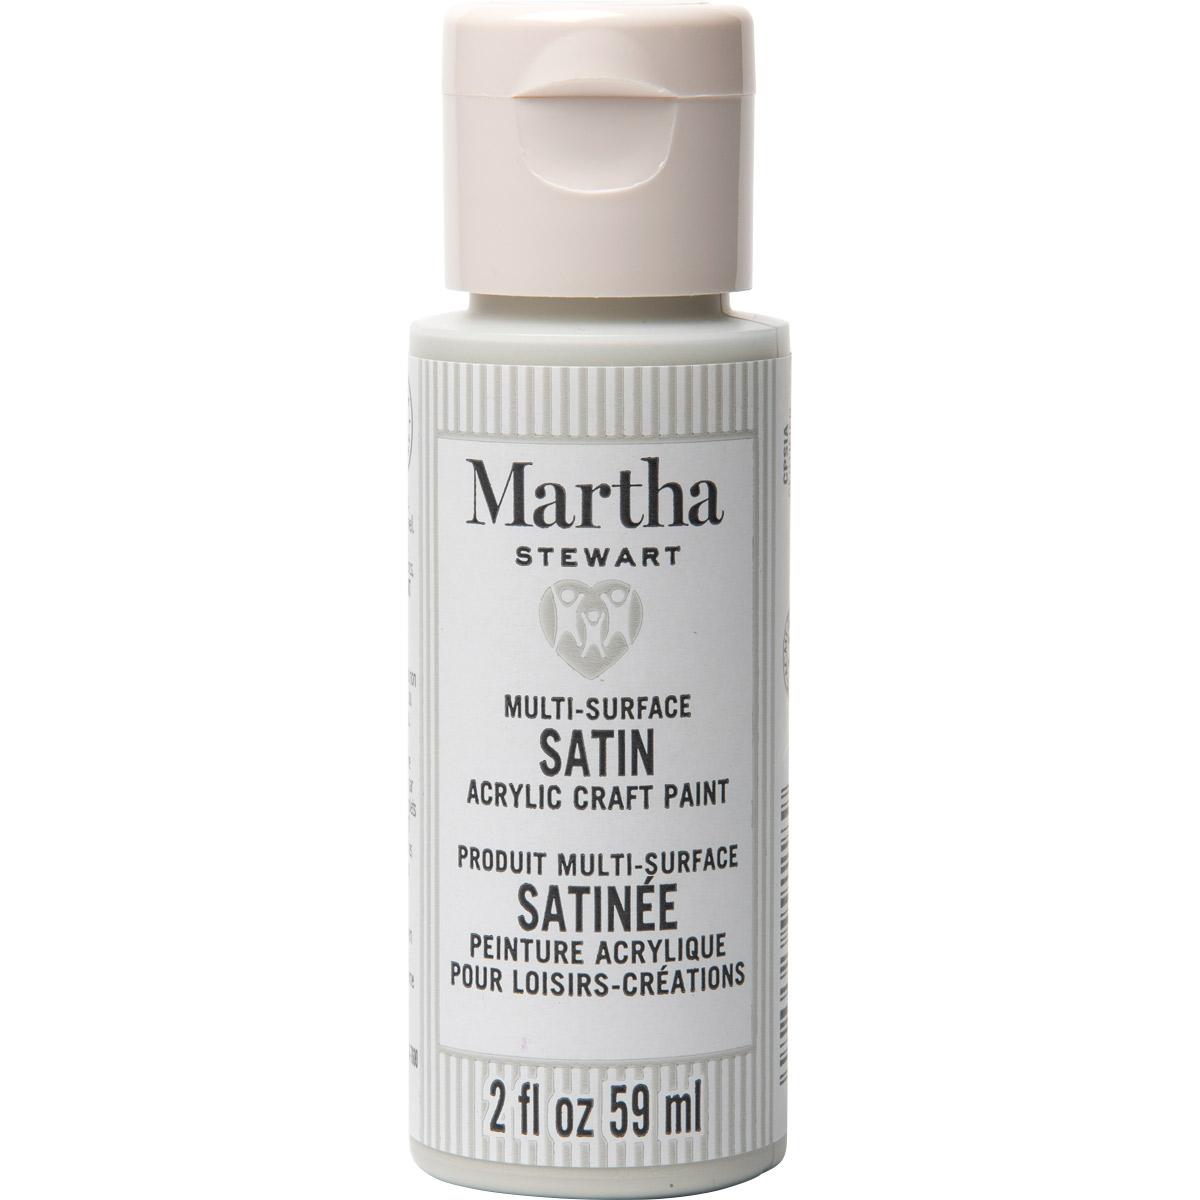 Martha Stewart ® Multi-Surface Satin Acrylic Craft Paint CPSIA - Downy, 2 oz.